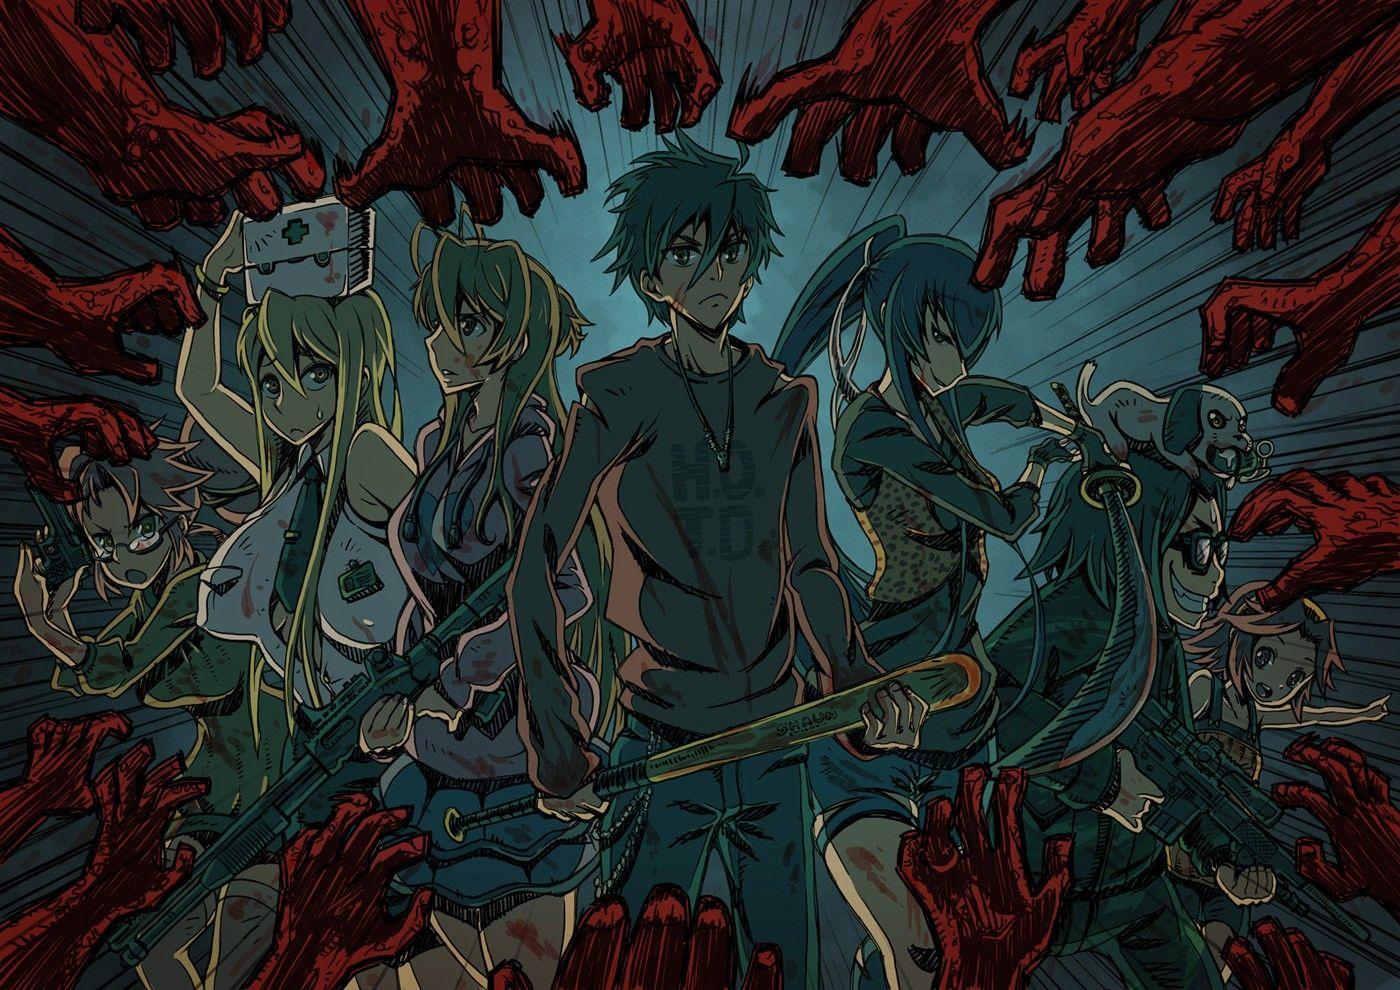 Anime 1400x990 Highschool of the Dead Komuro Takashi